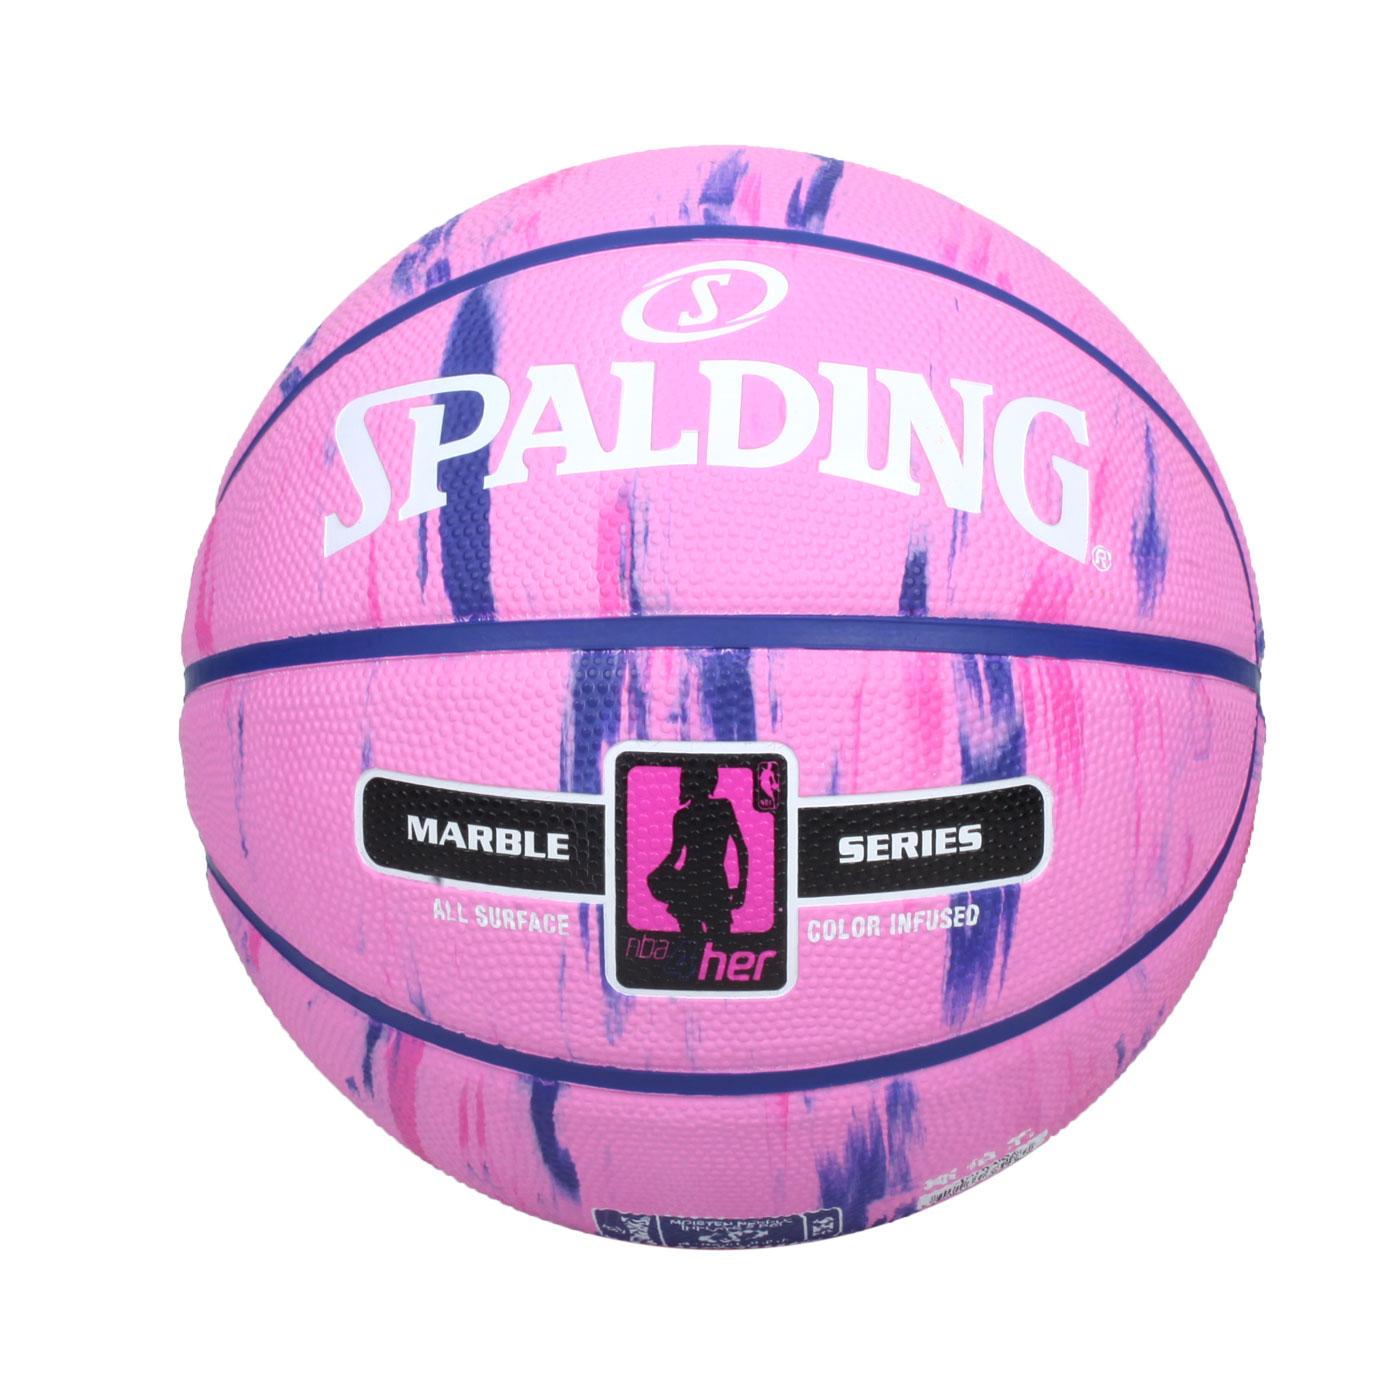 SPALDING NBA 4Her #6號女用橡膠籃球 SPA38208 SPA83877 - 粉紫白